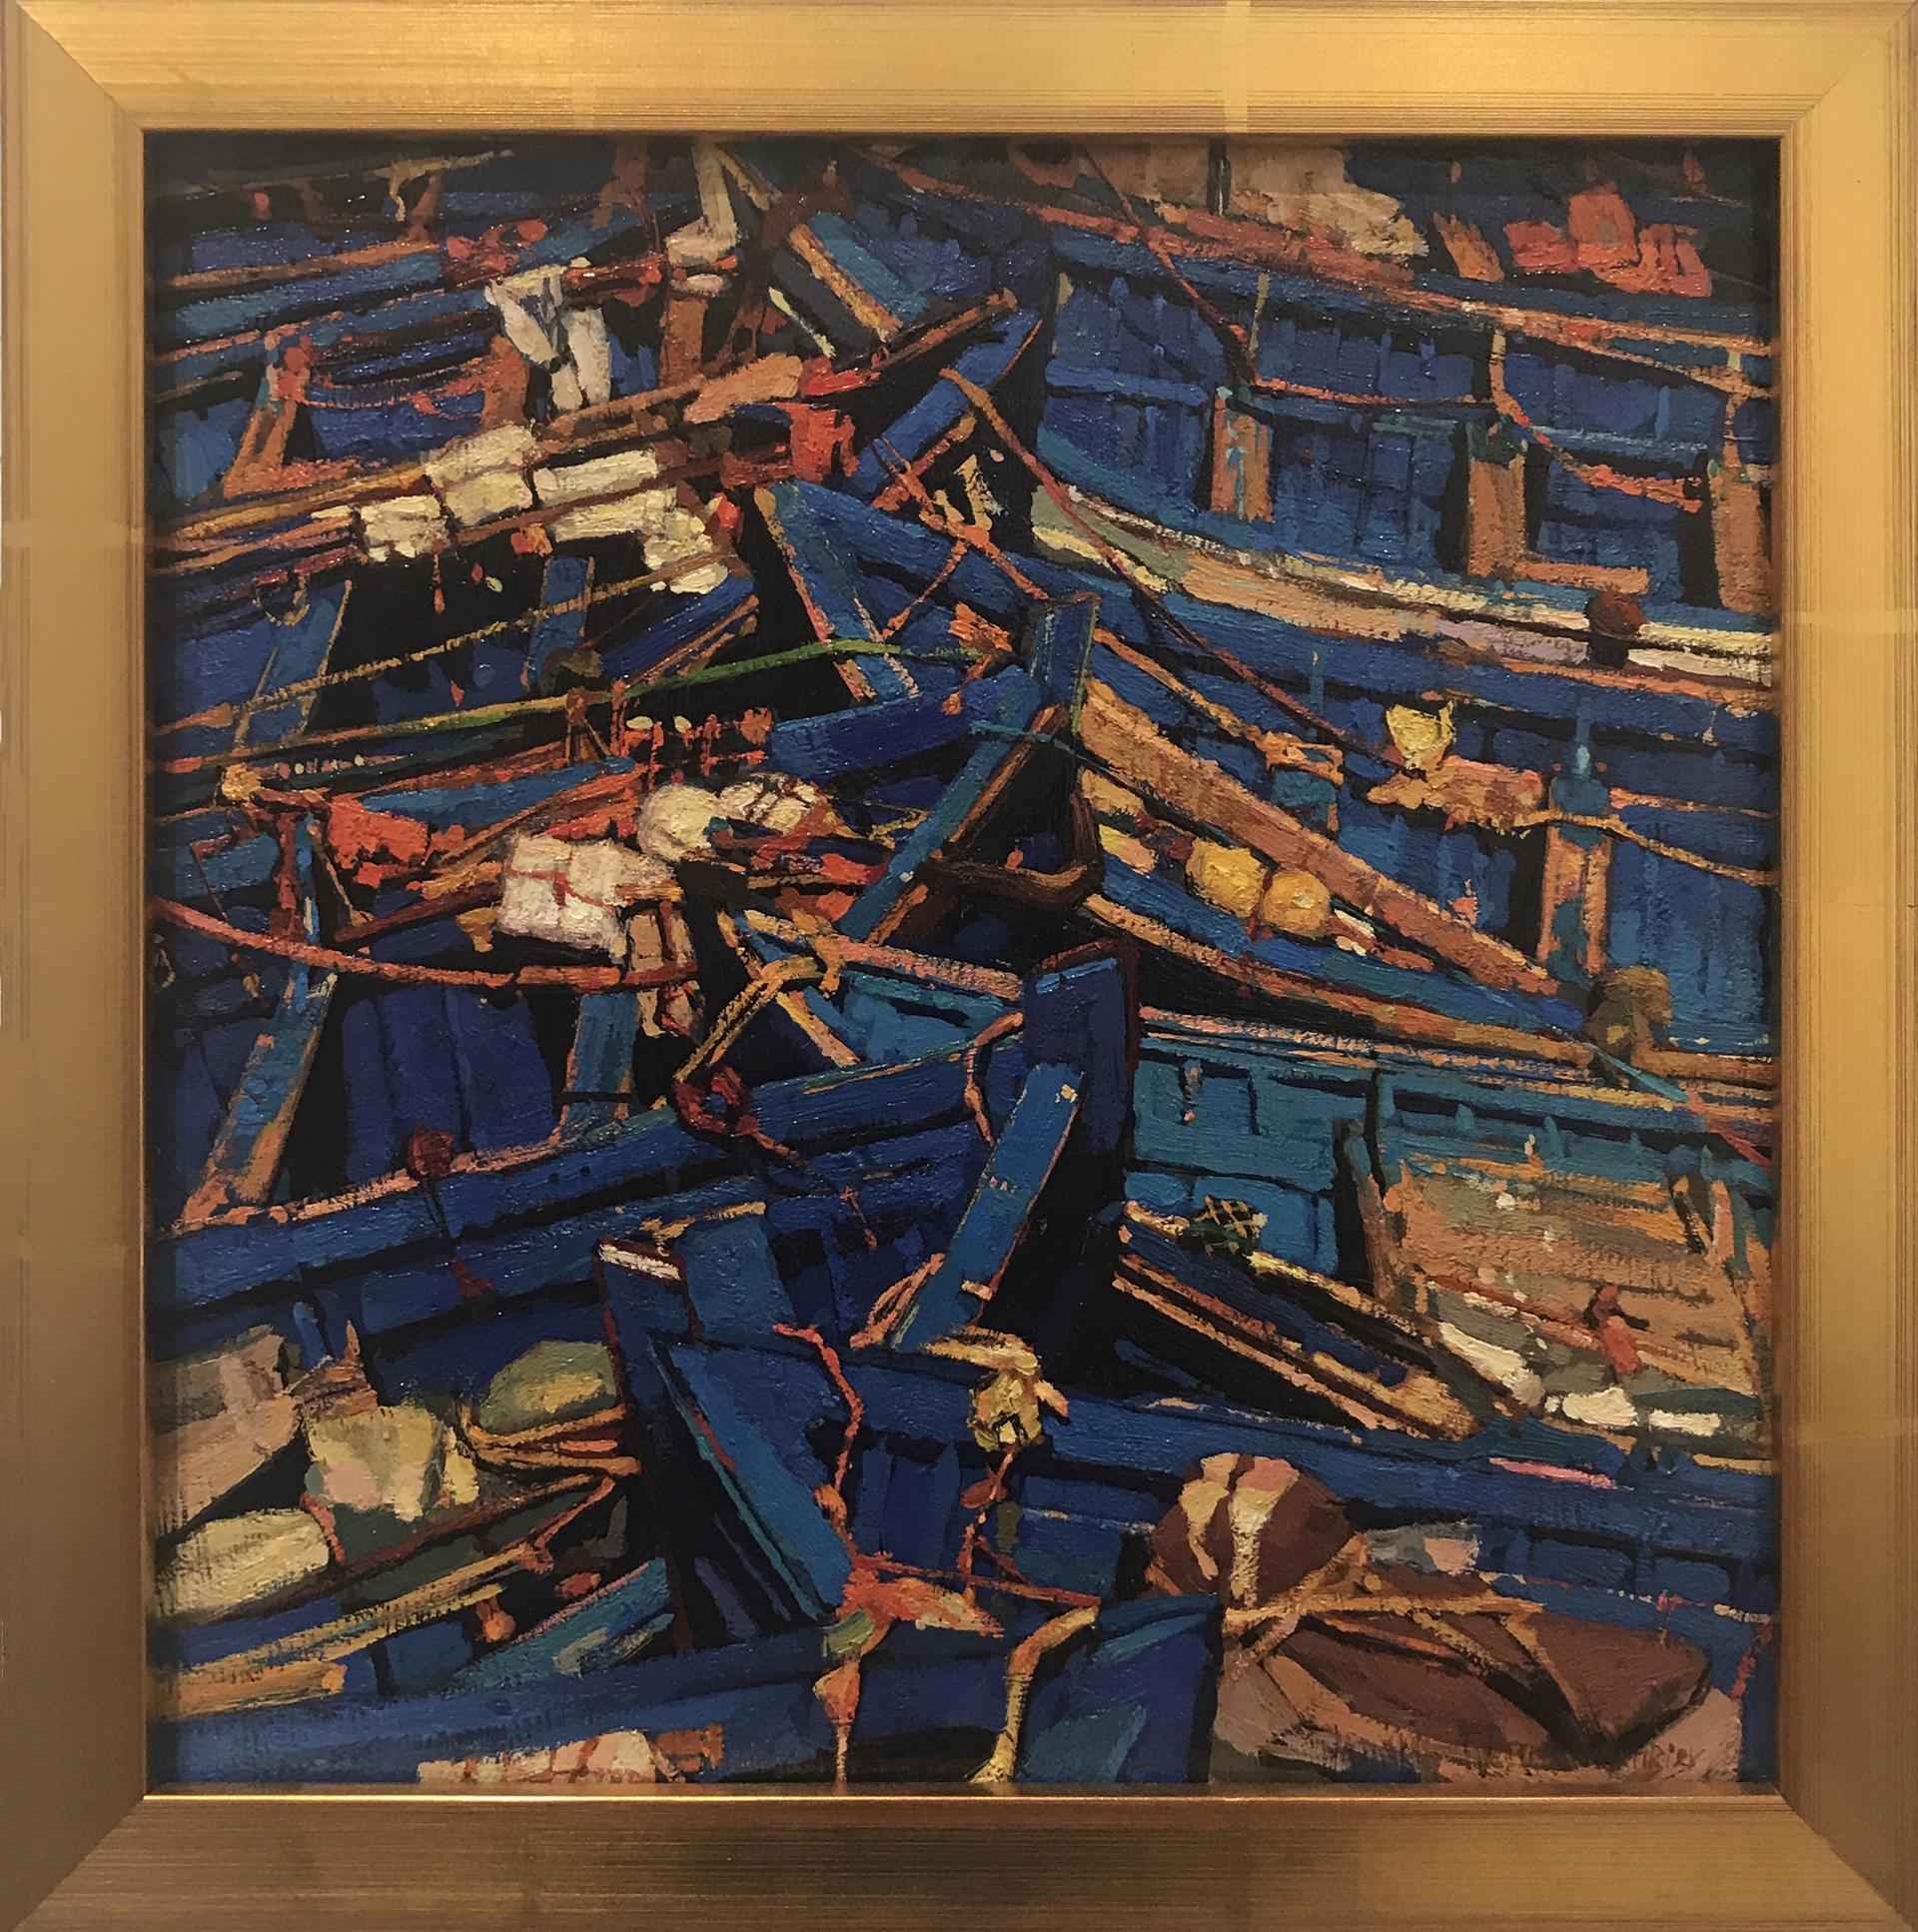 Blue Number 5 by Timur Akhriev